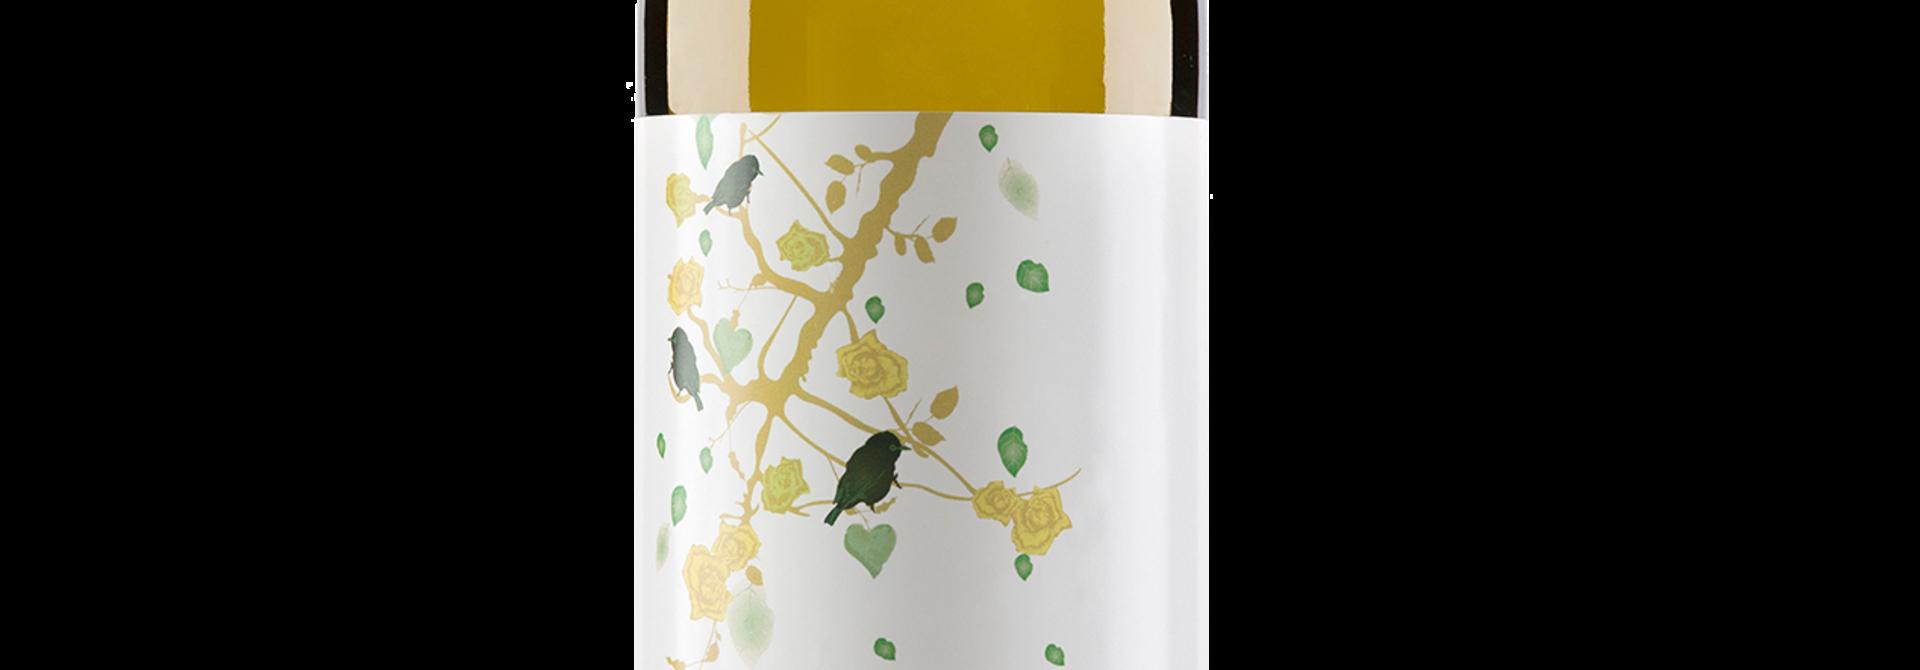 99 Rosas Chardonnay-Viognier